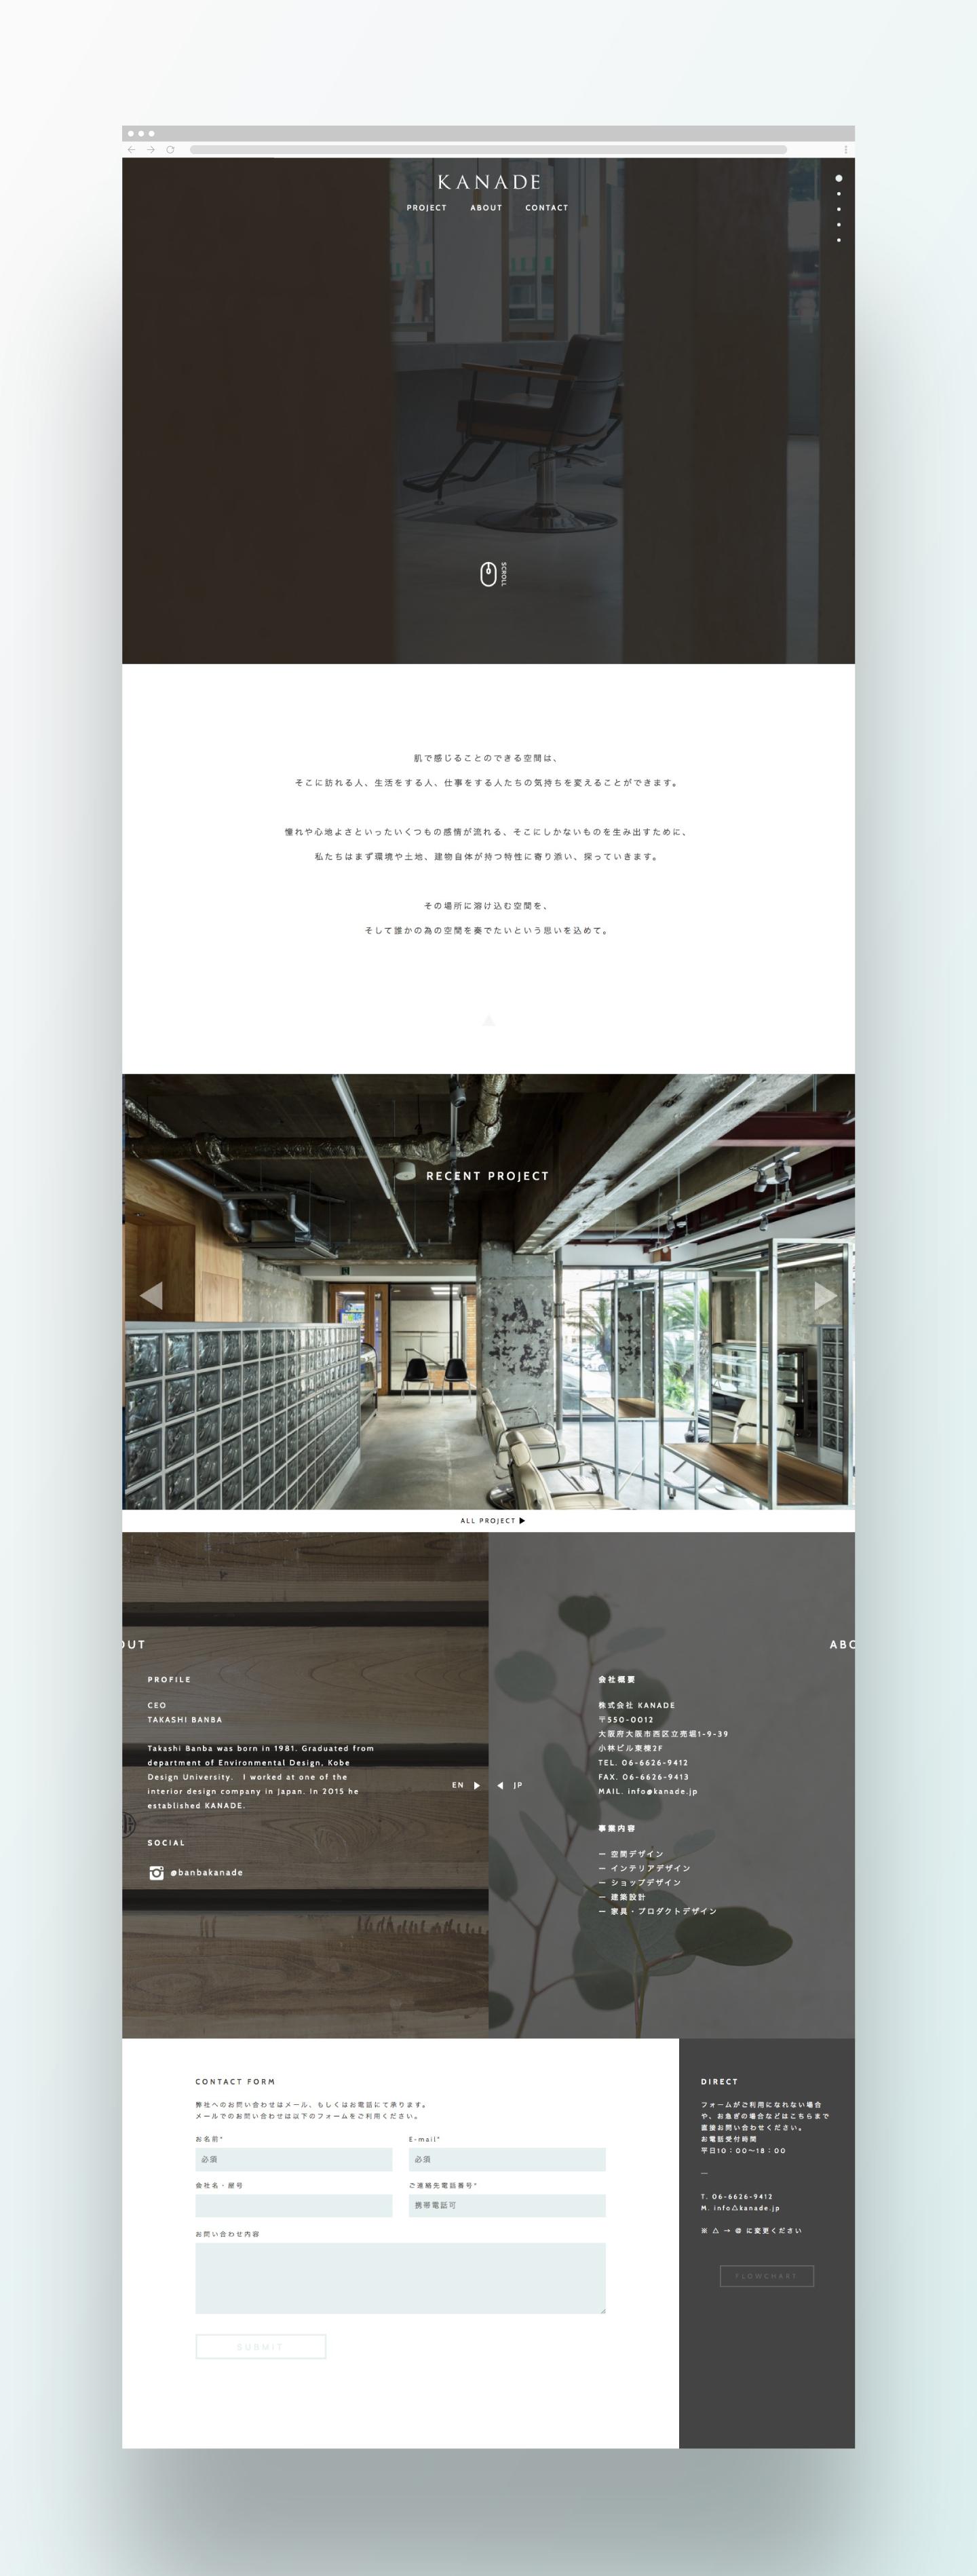 KANADE|Web Design